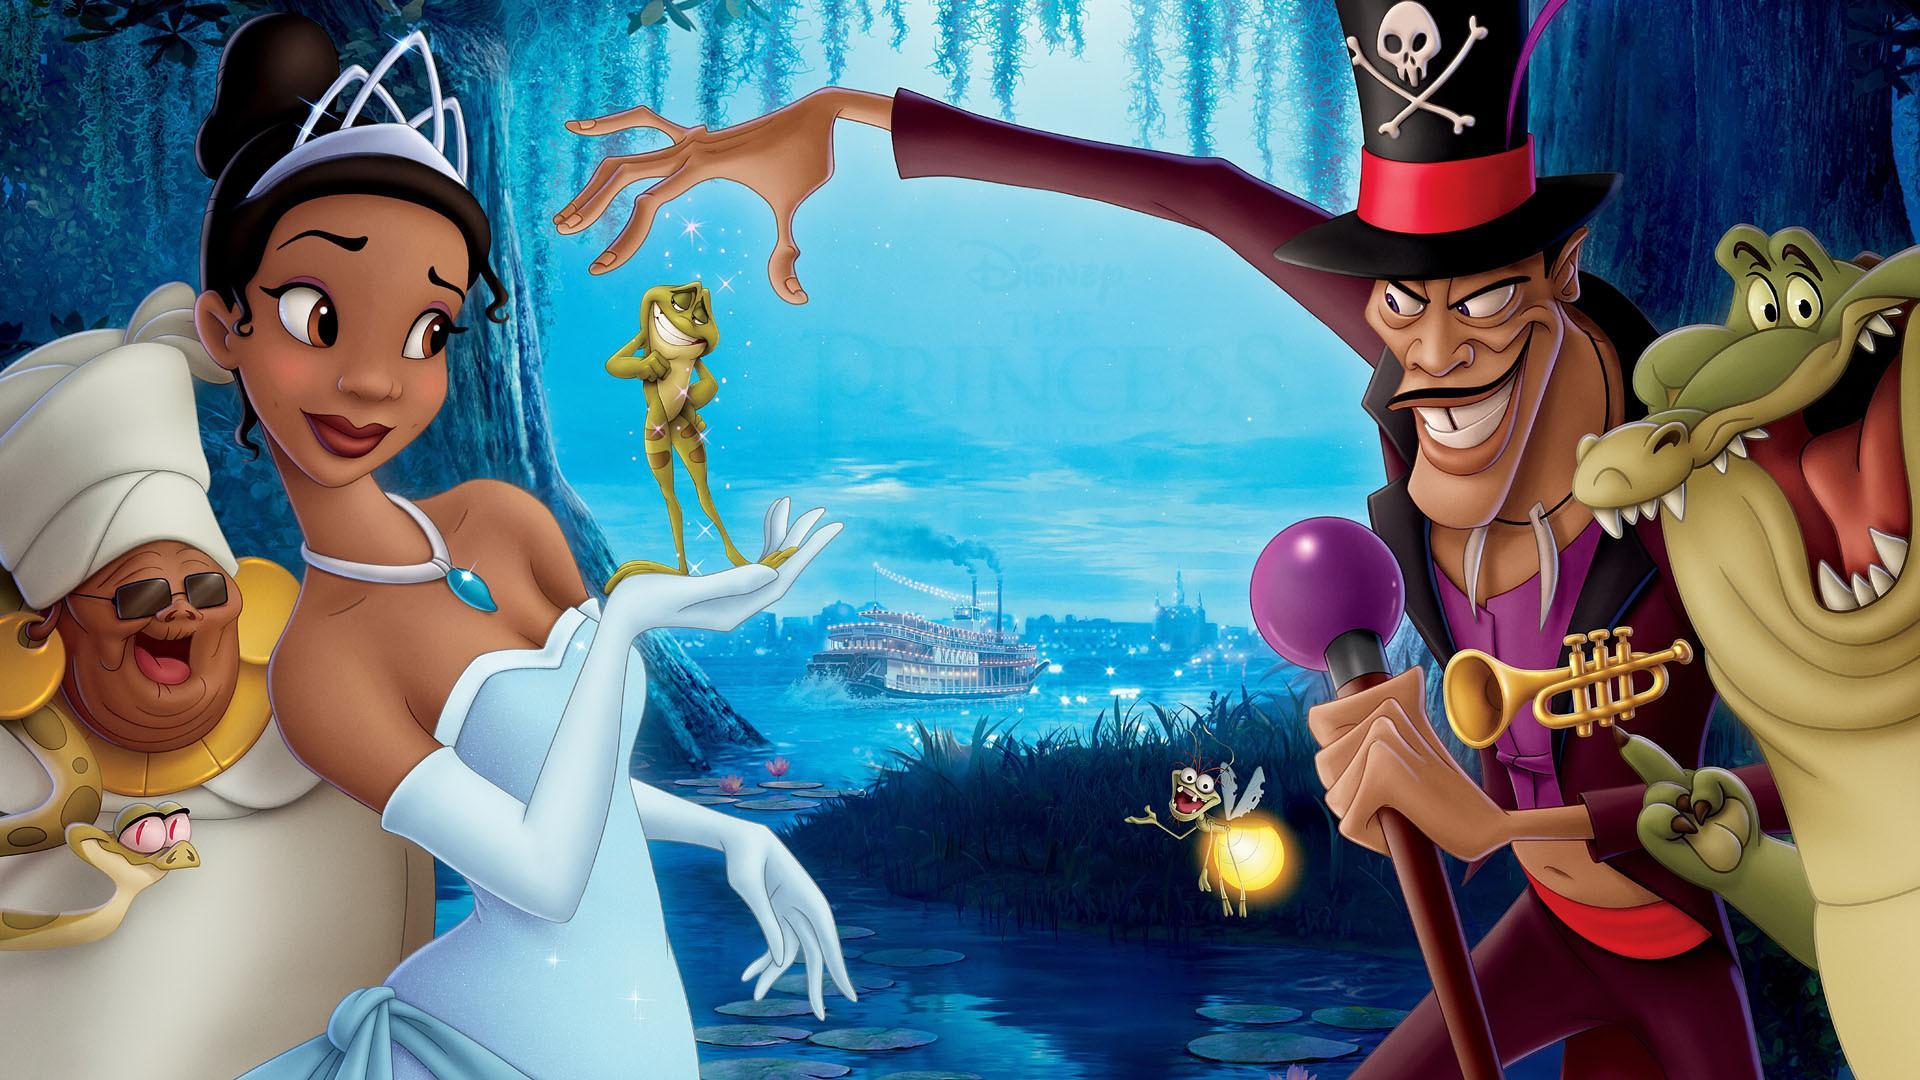 Animation Cartoon Full Movie the 8 best walt disney animation movies since 2000 — geektyrant